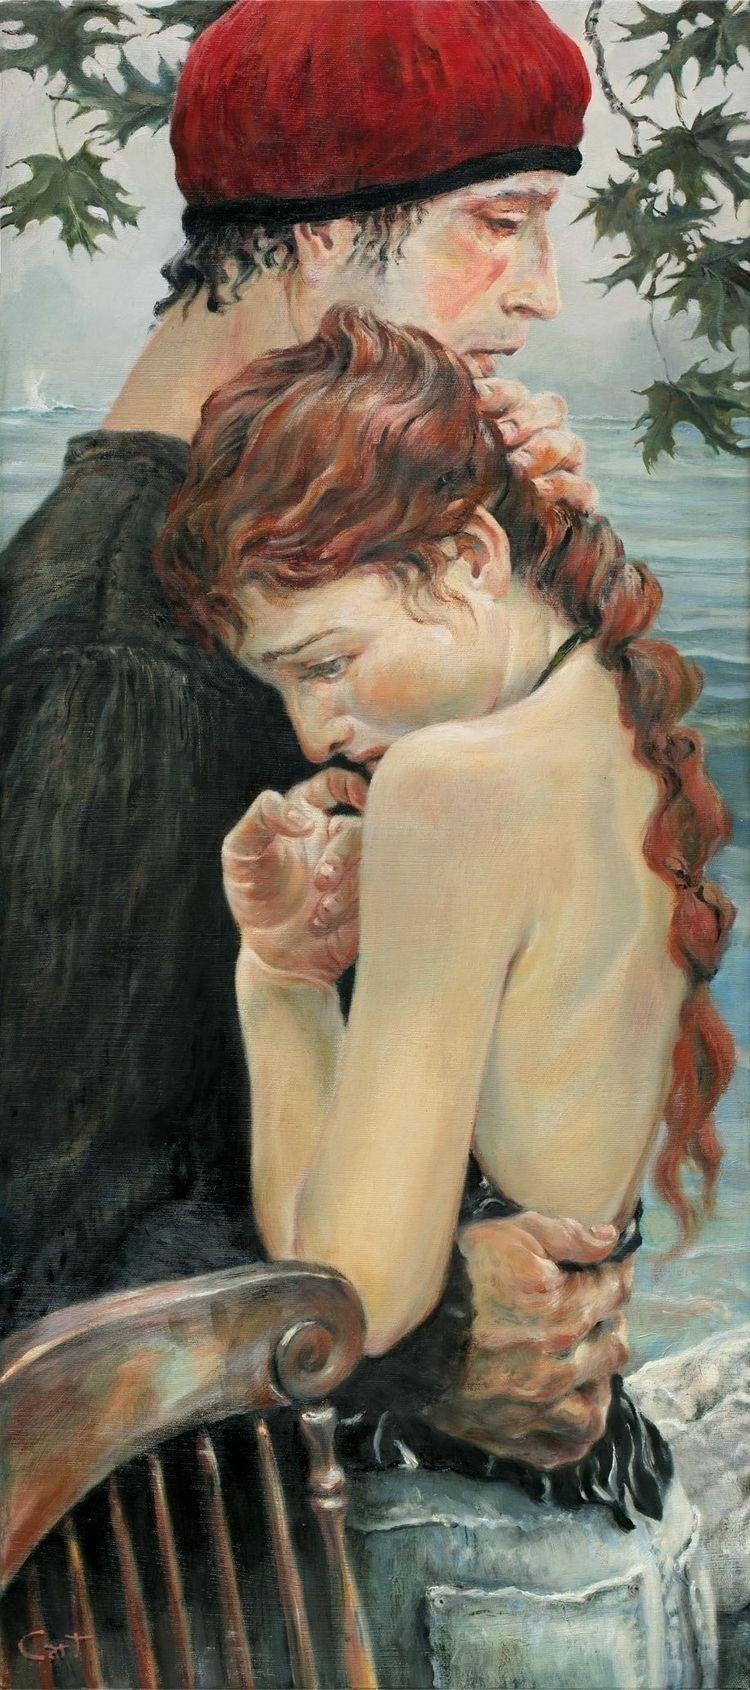 Tides, Christopher Cart, oil ca - chriscart | ello